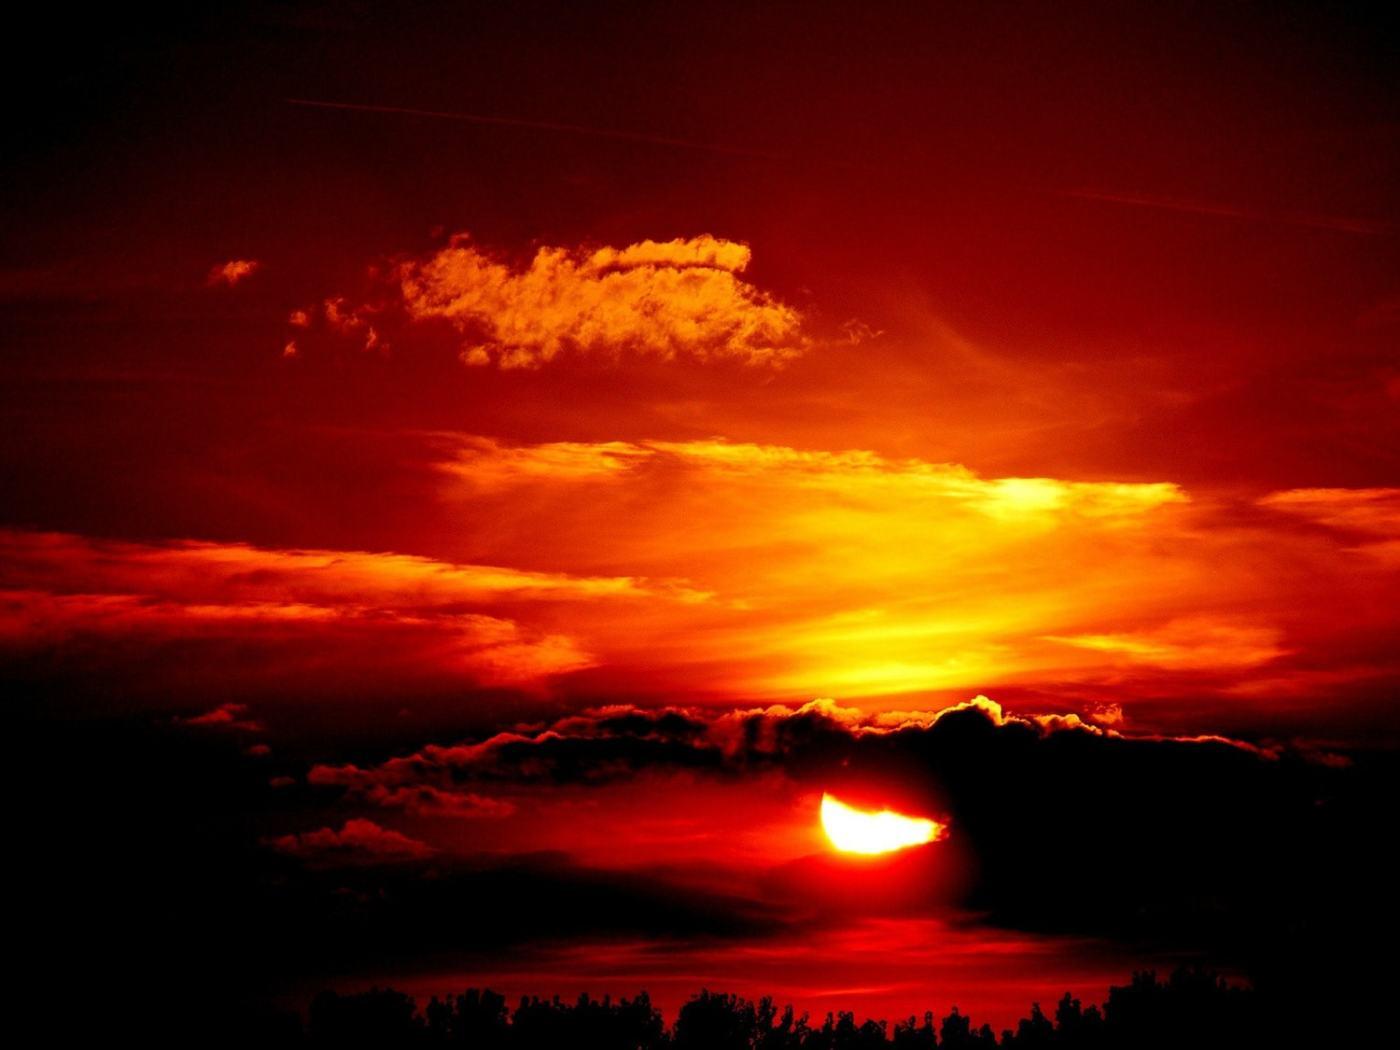 sunset-472981_1920